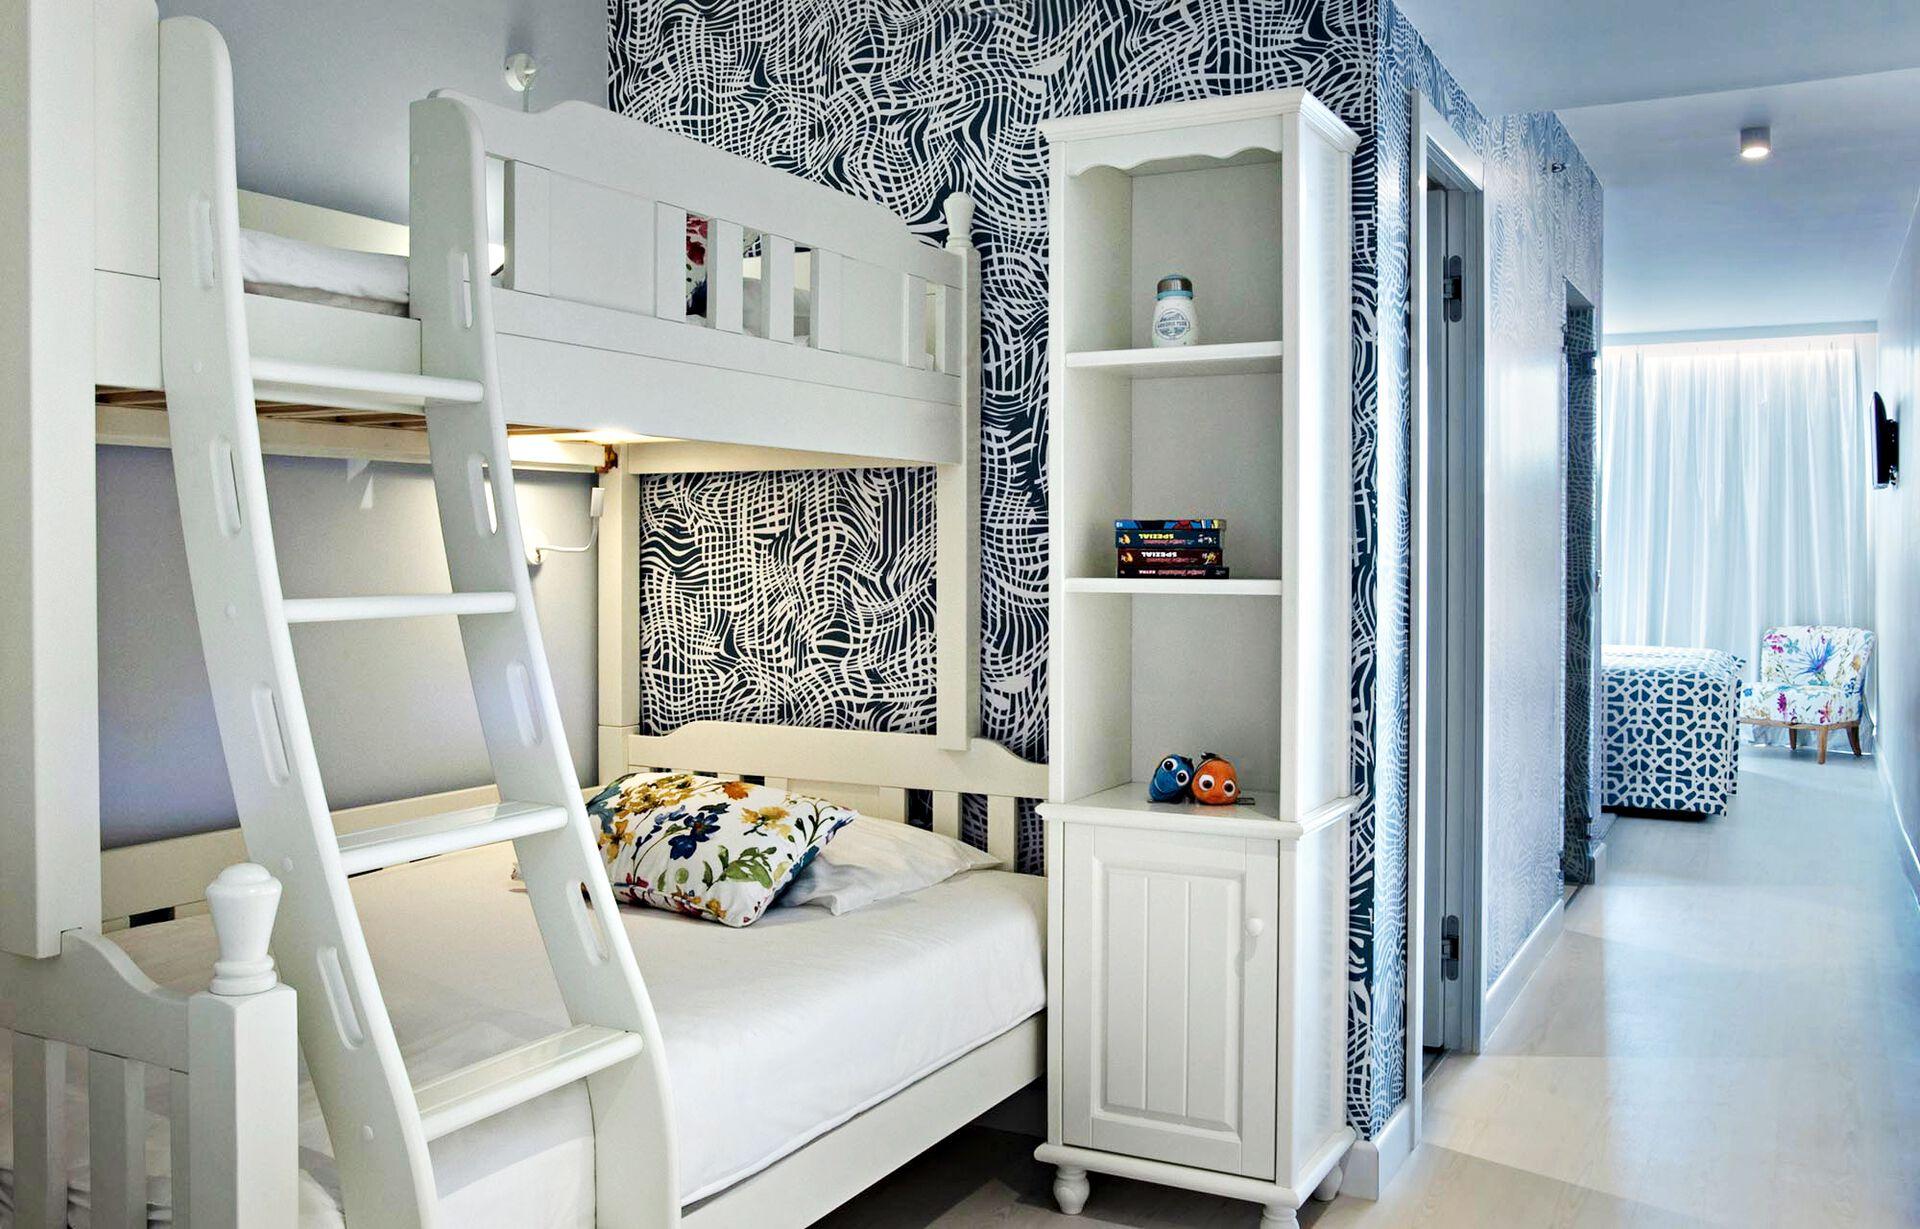 Croatie - Split - Amadria Park Hôtel Jakov 4*